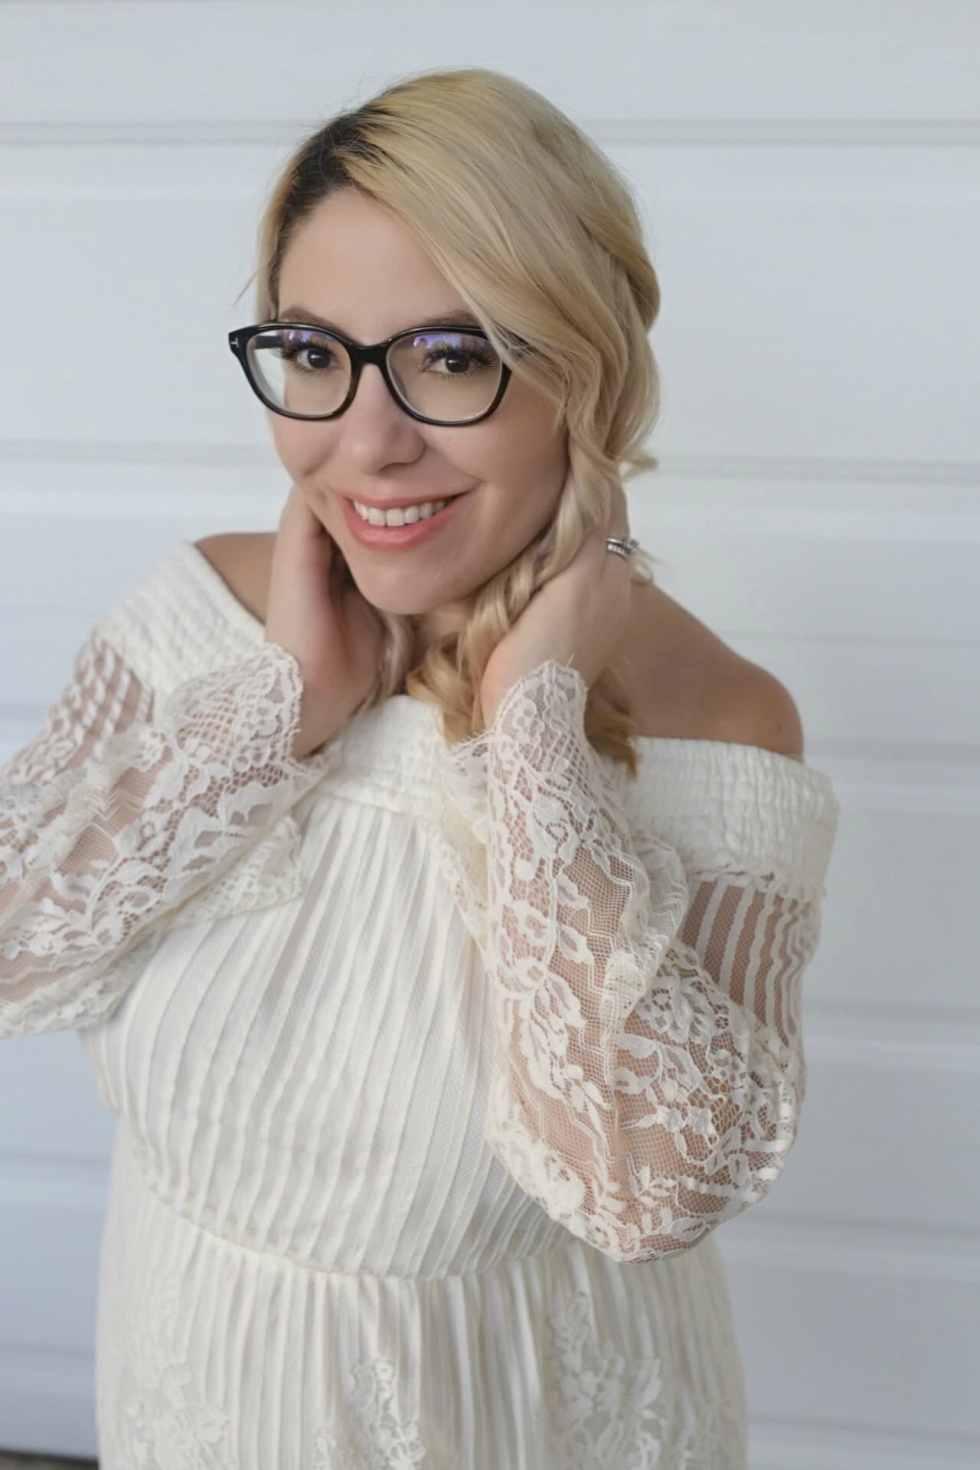 Stylish Glasses for Less